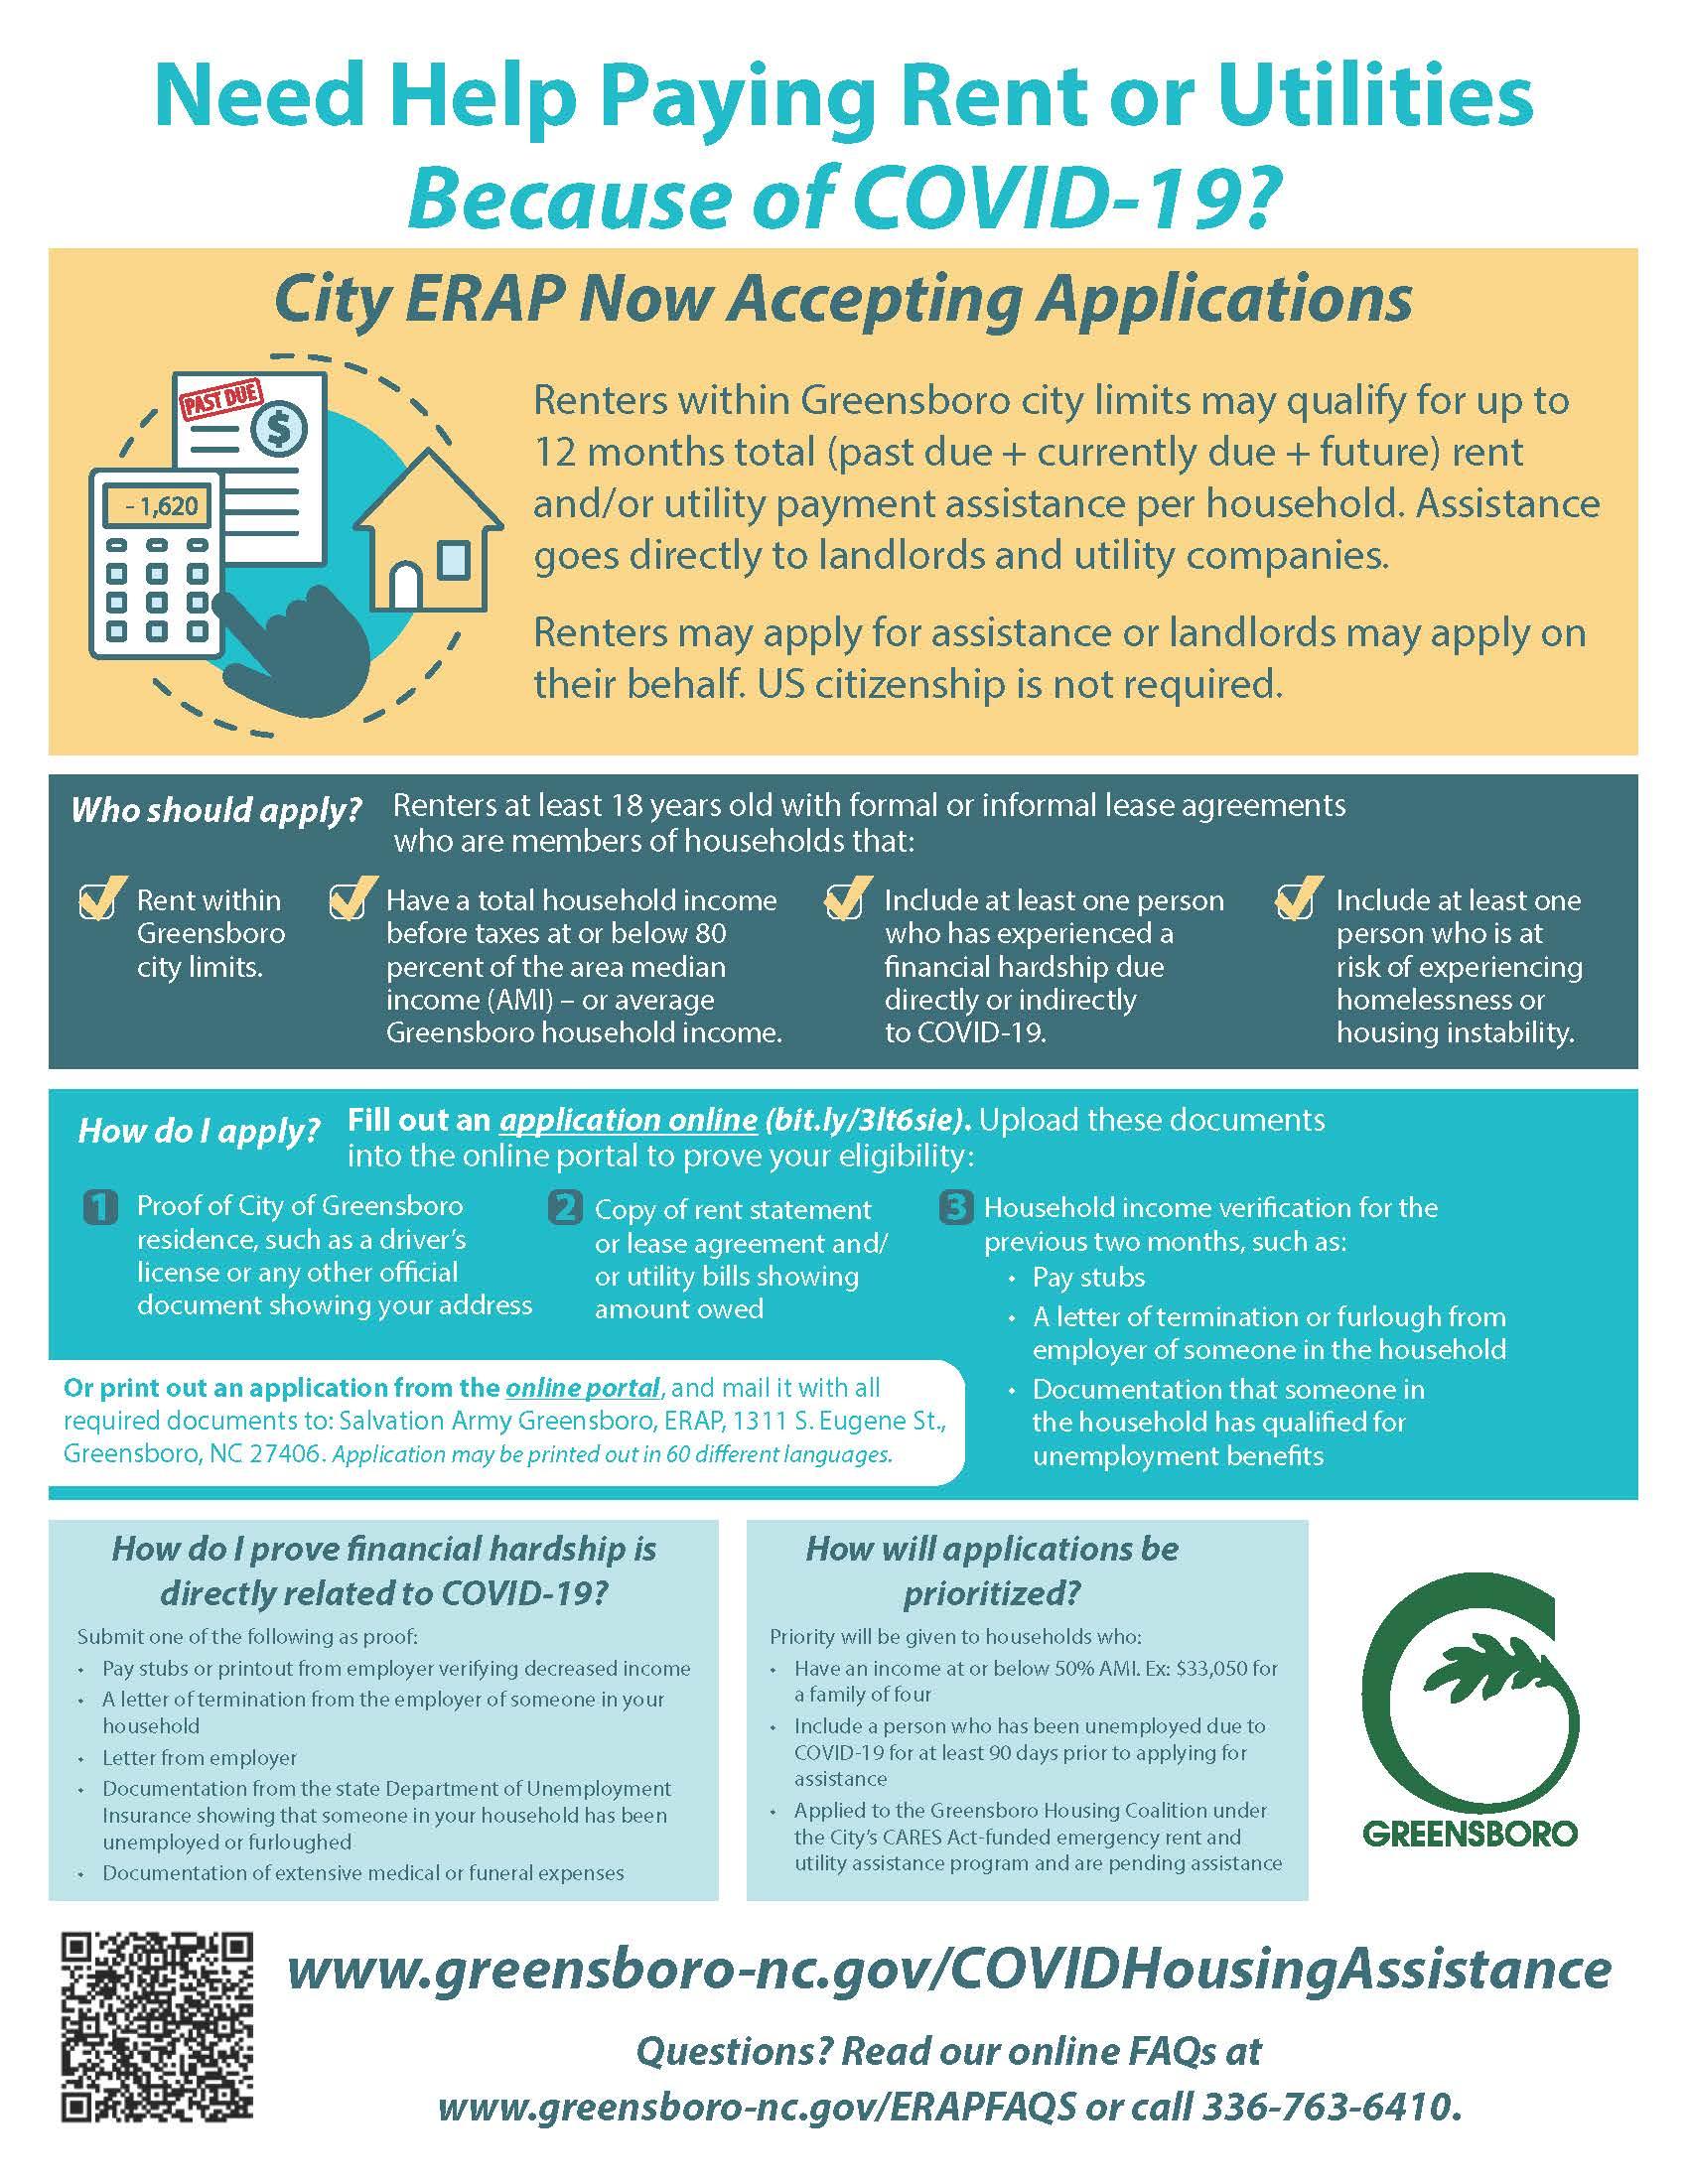 Covid 19 Housing Assistance Greensboro Nc